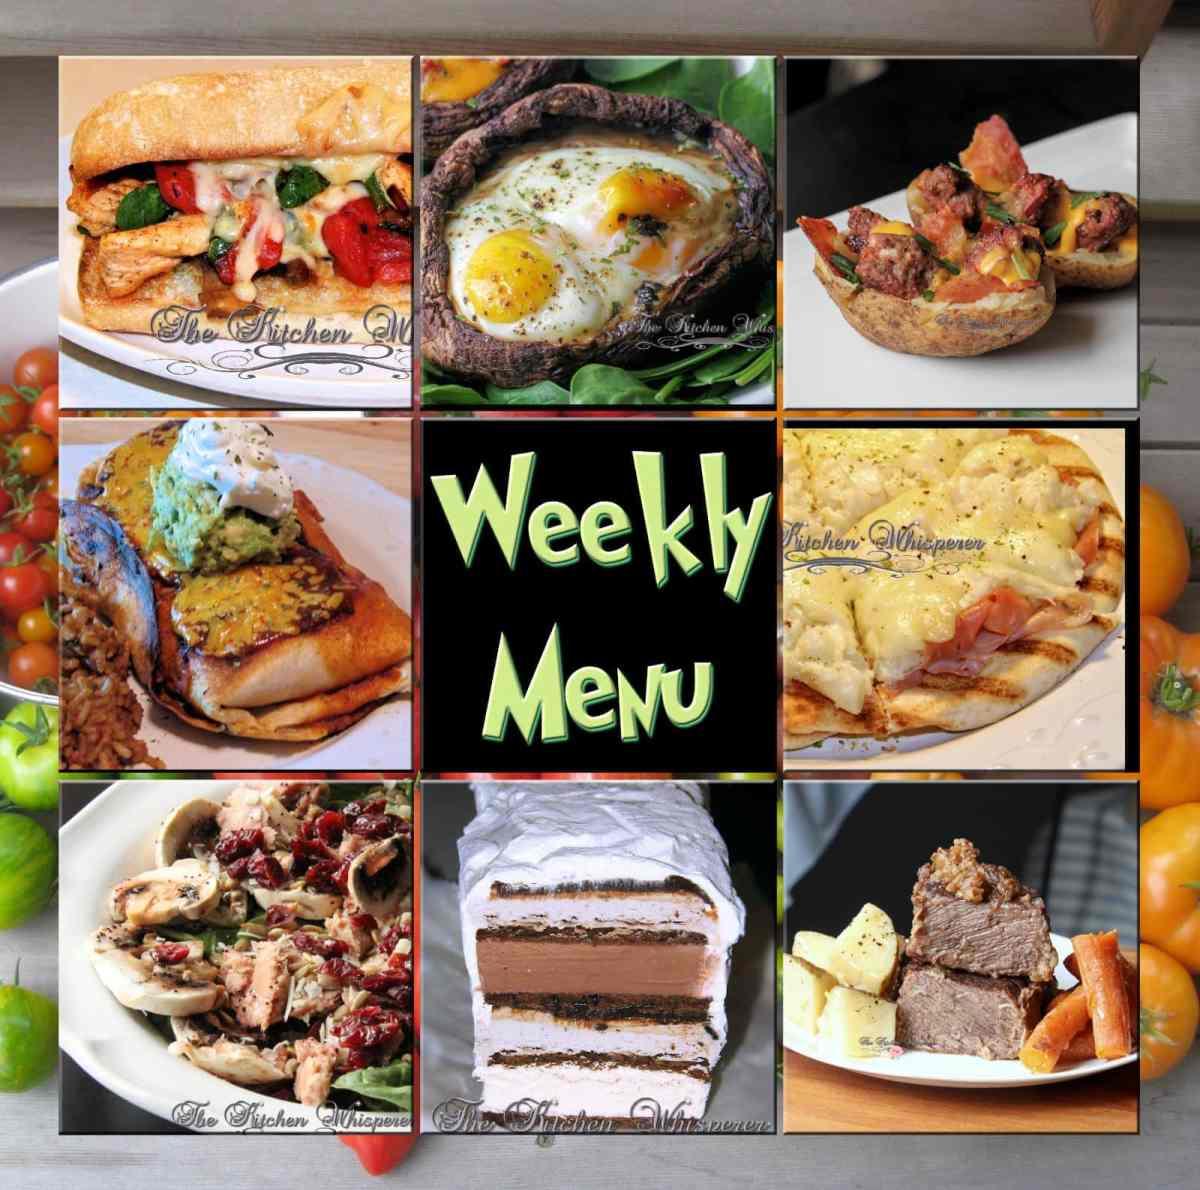 Kitchen Impossible 31 07: Weekly Menu